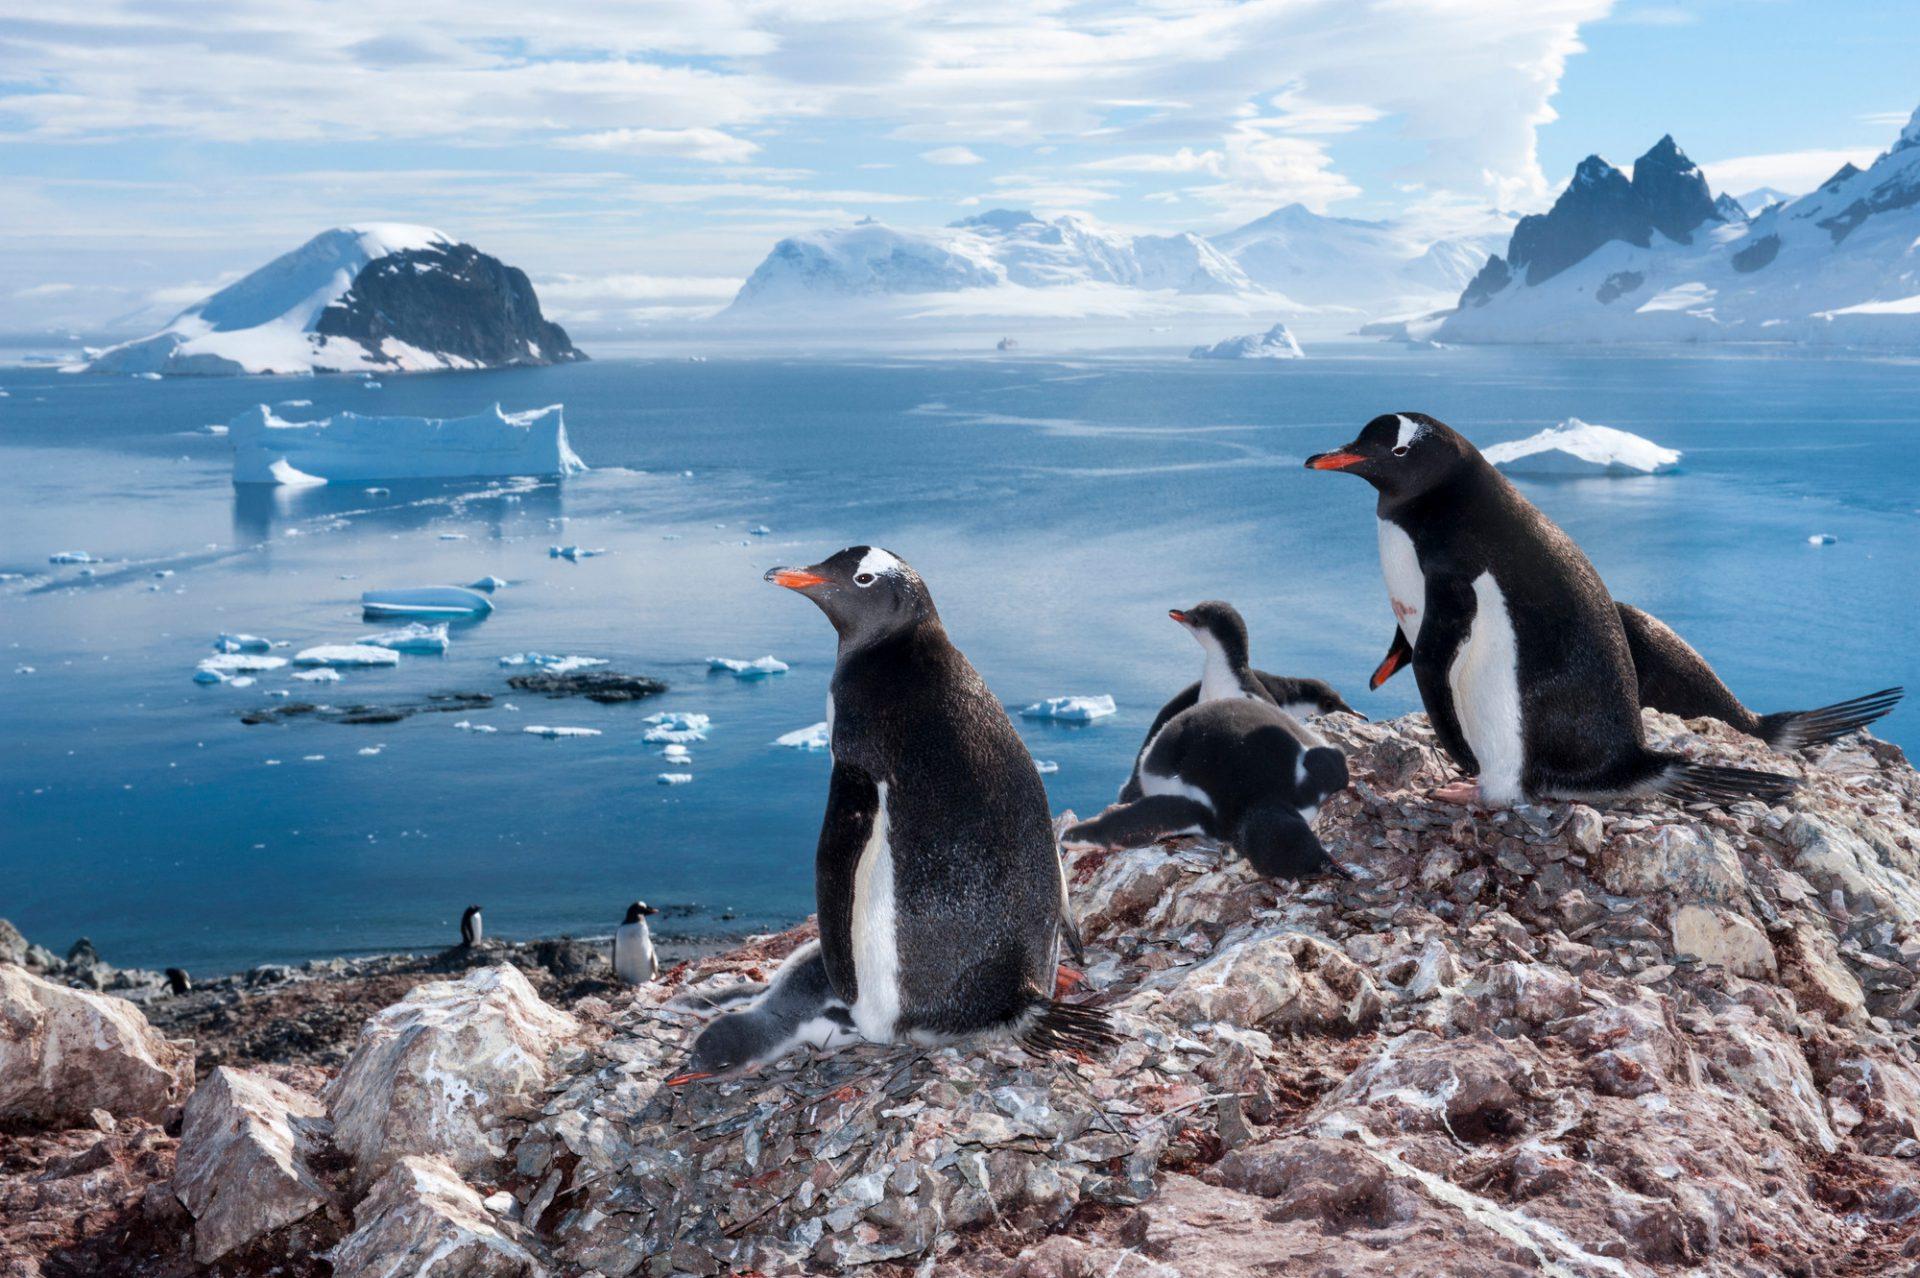 A gentoo penguin (Pygoscelis papua papua) colony on Danco Island, Antarctica.